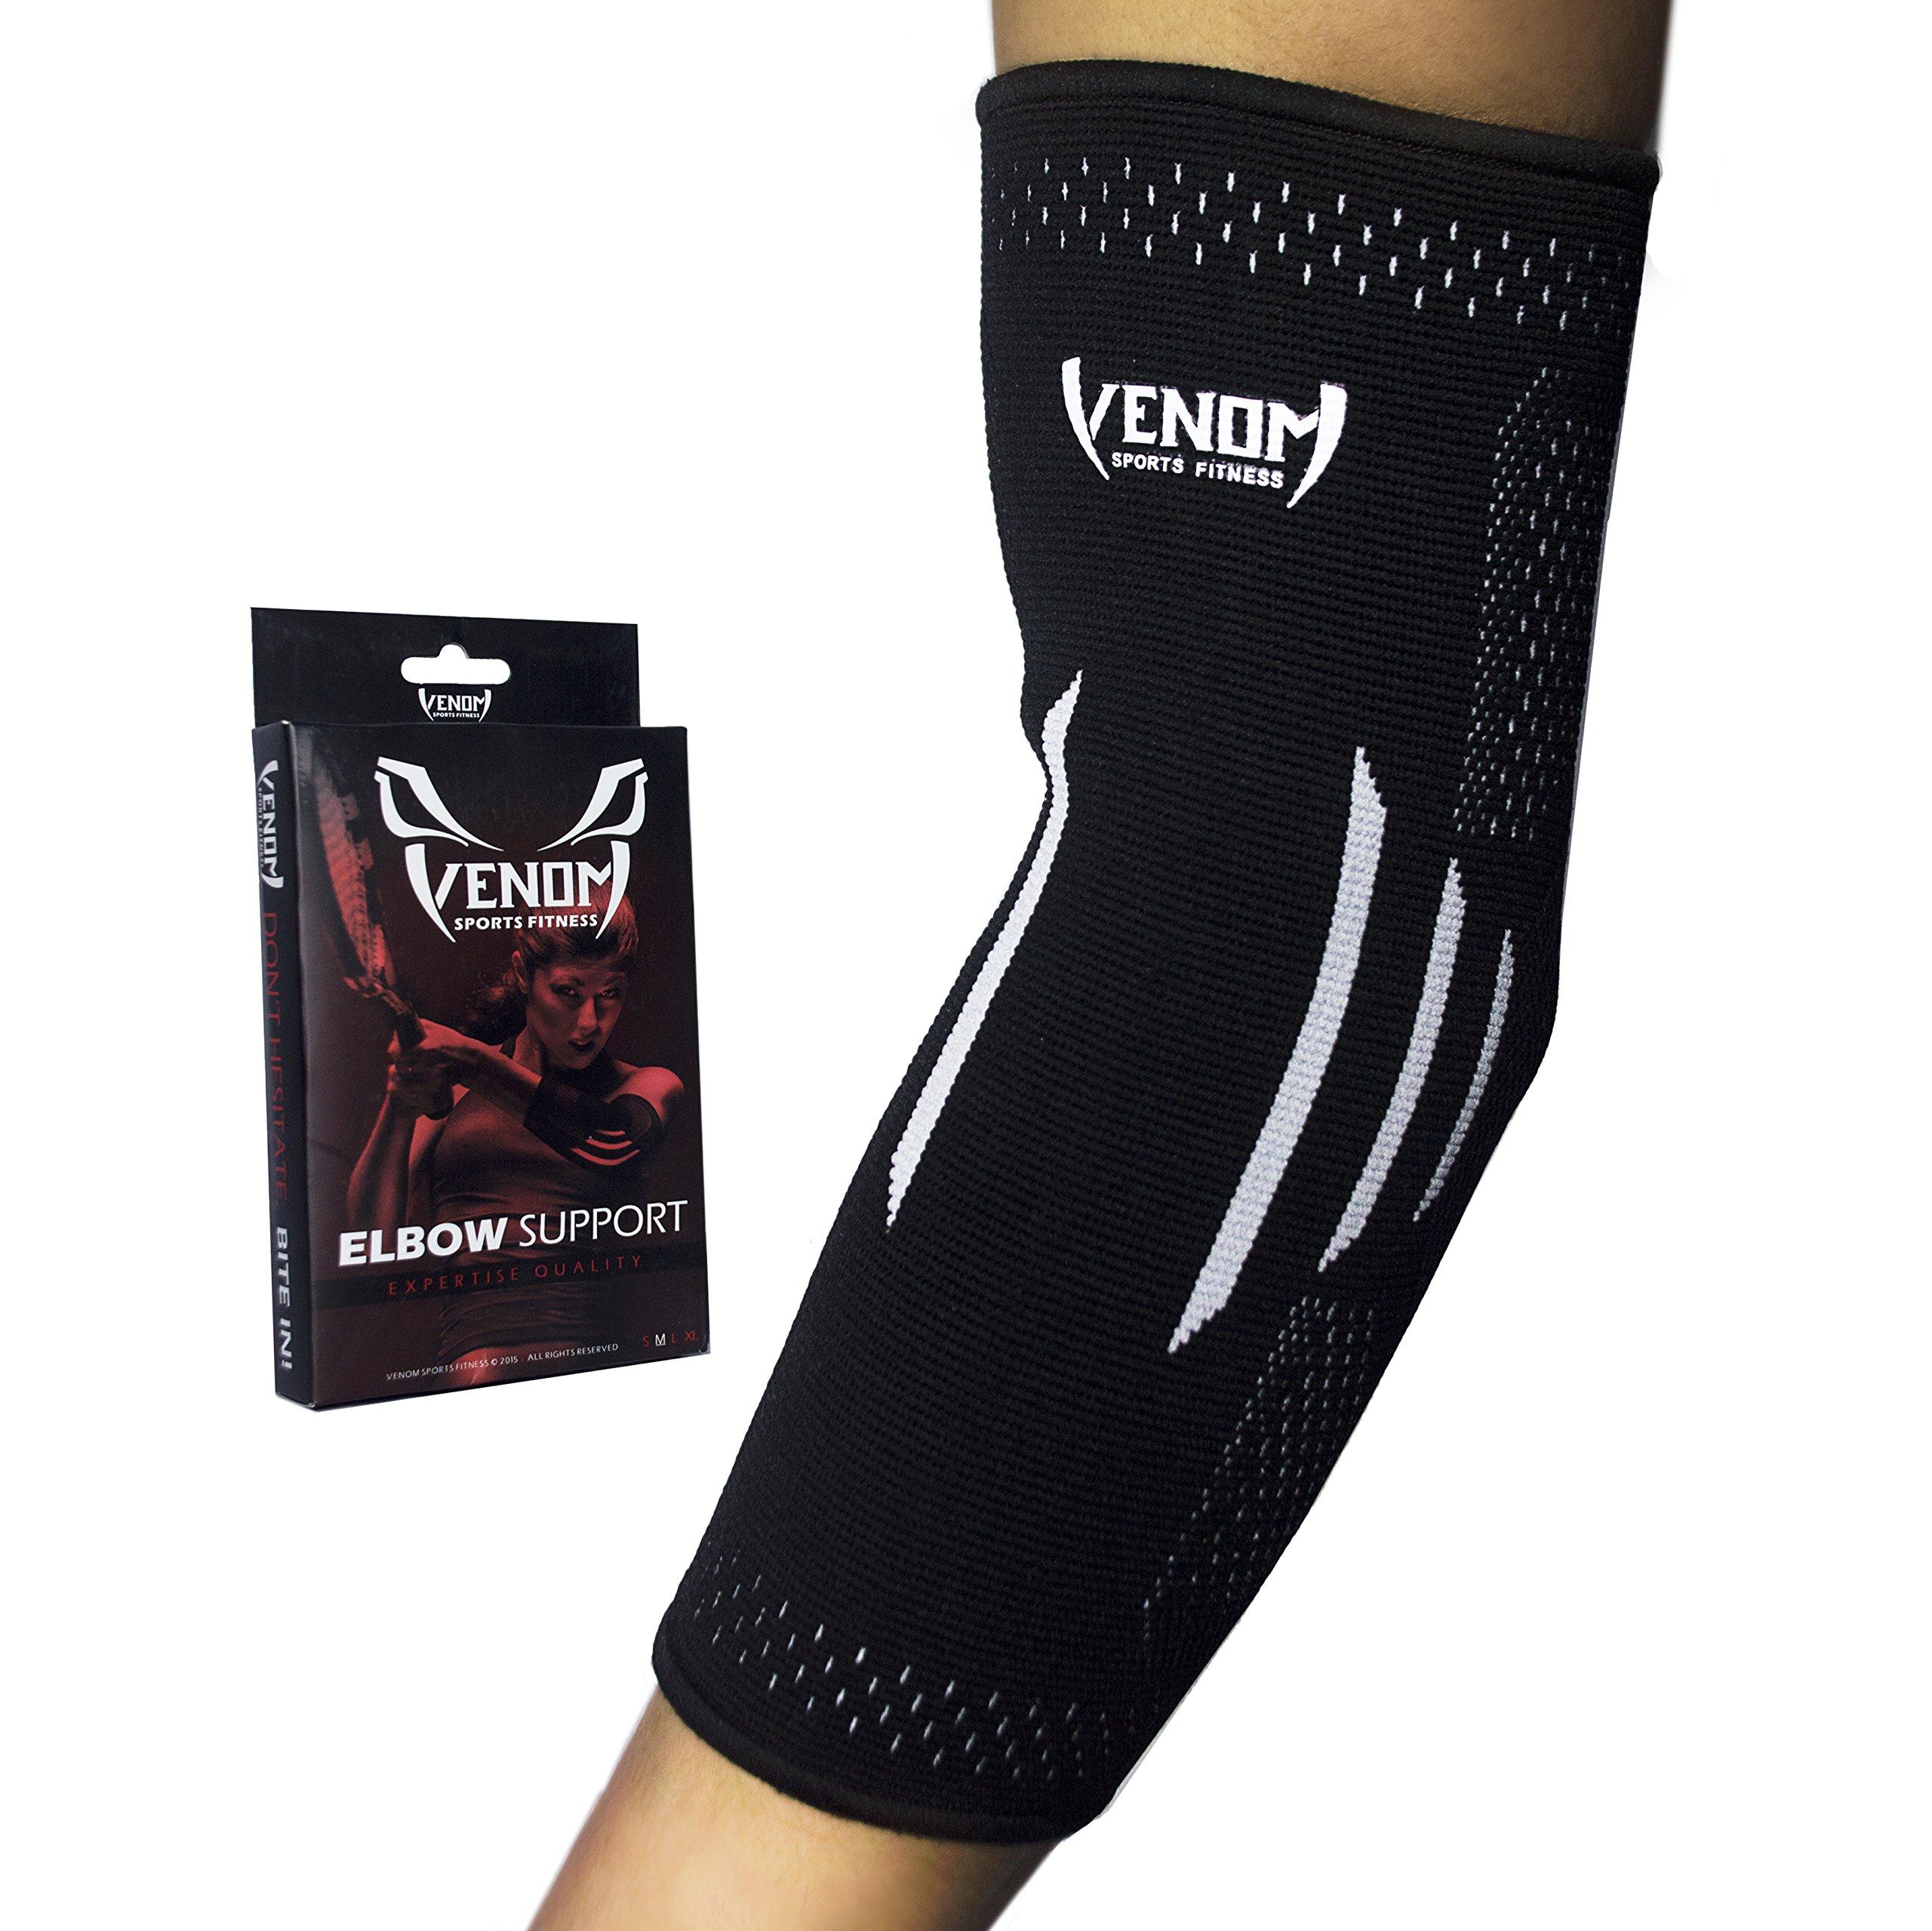 Venom Elbow Brace Compression Sleeve - Elastic Support for Tendonitis Pain, Tennis Elbow, Golfer's Elbow, Arthritis, Bursitis, Basketball, Baseball, Football, Golf, Lifting, Sports, Men, Women (XL)